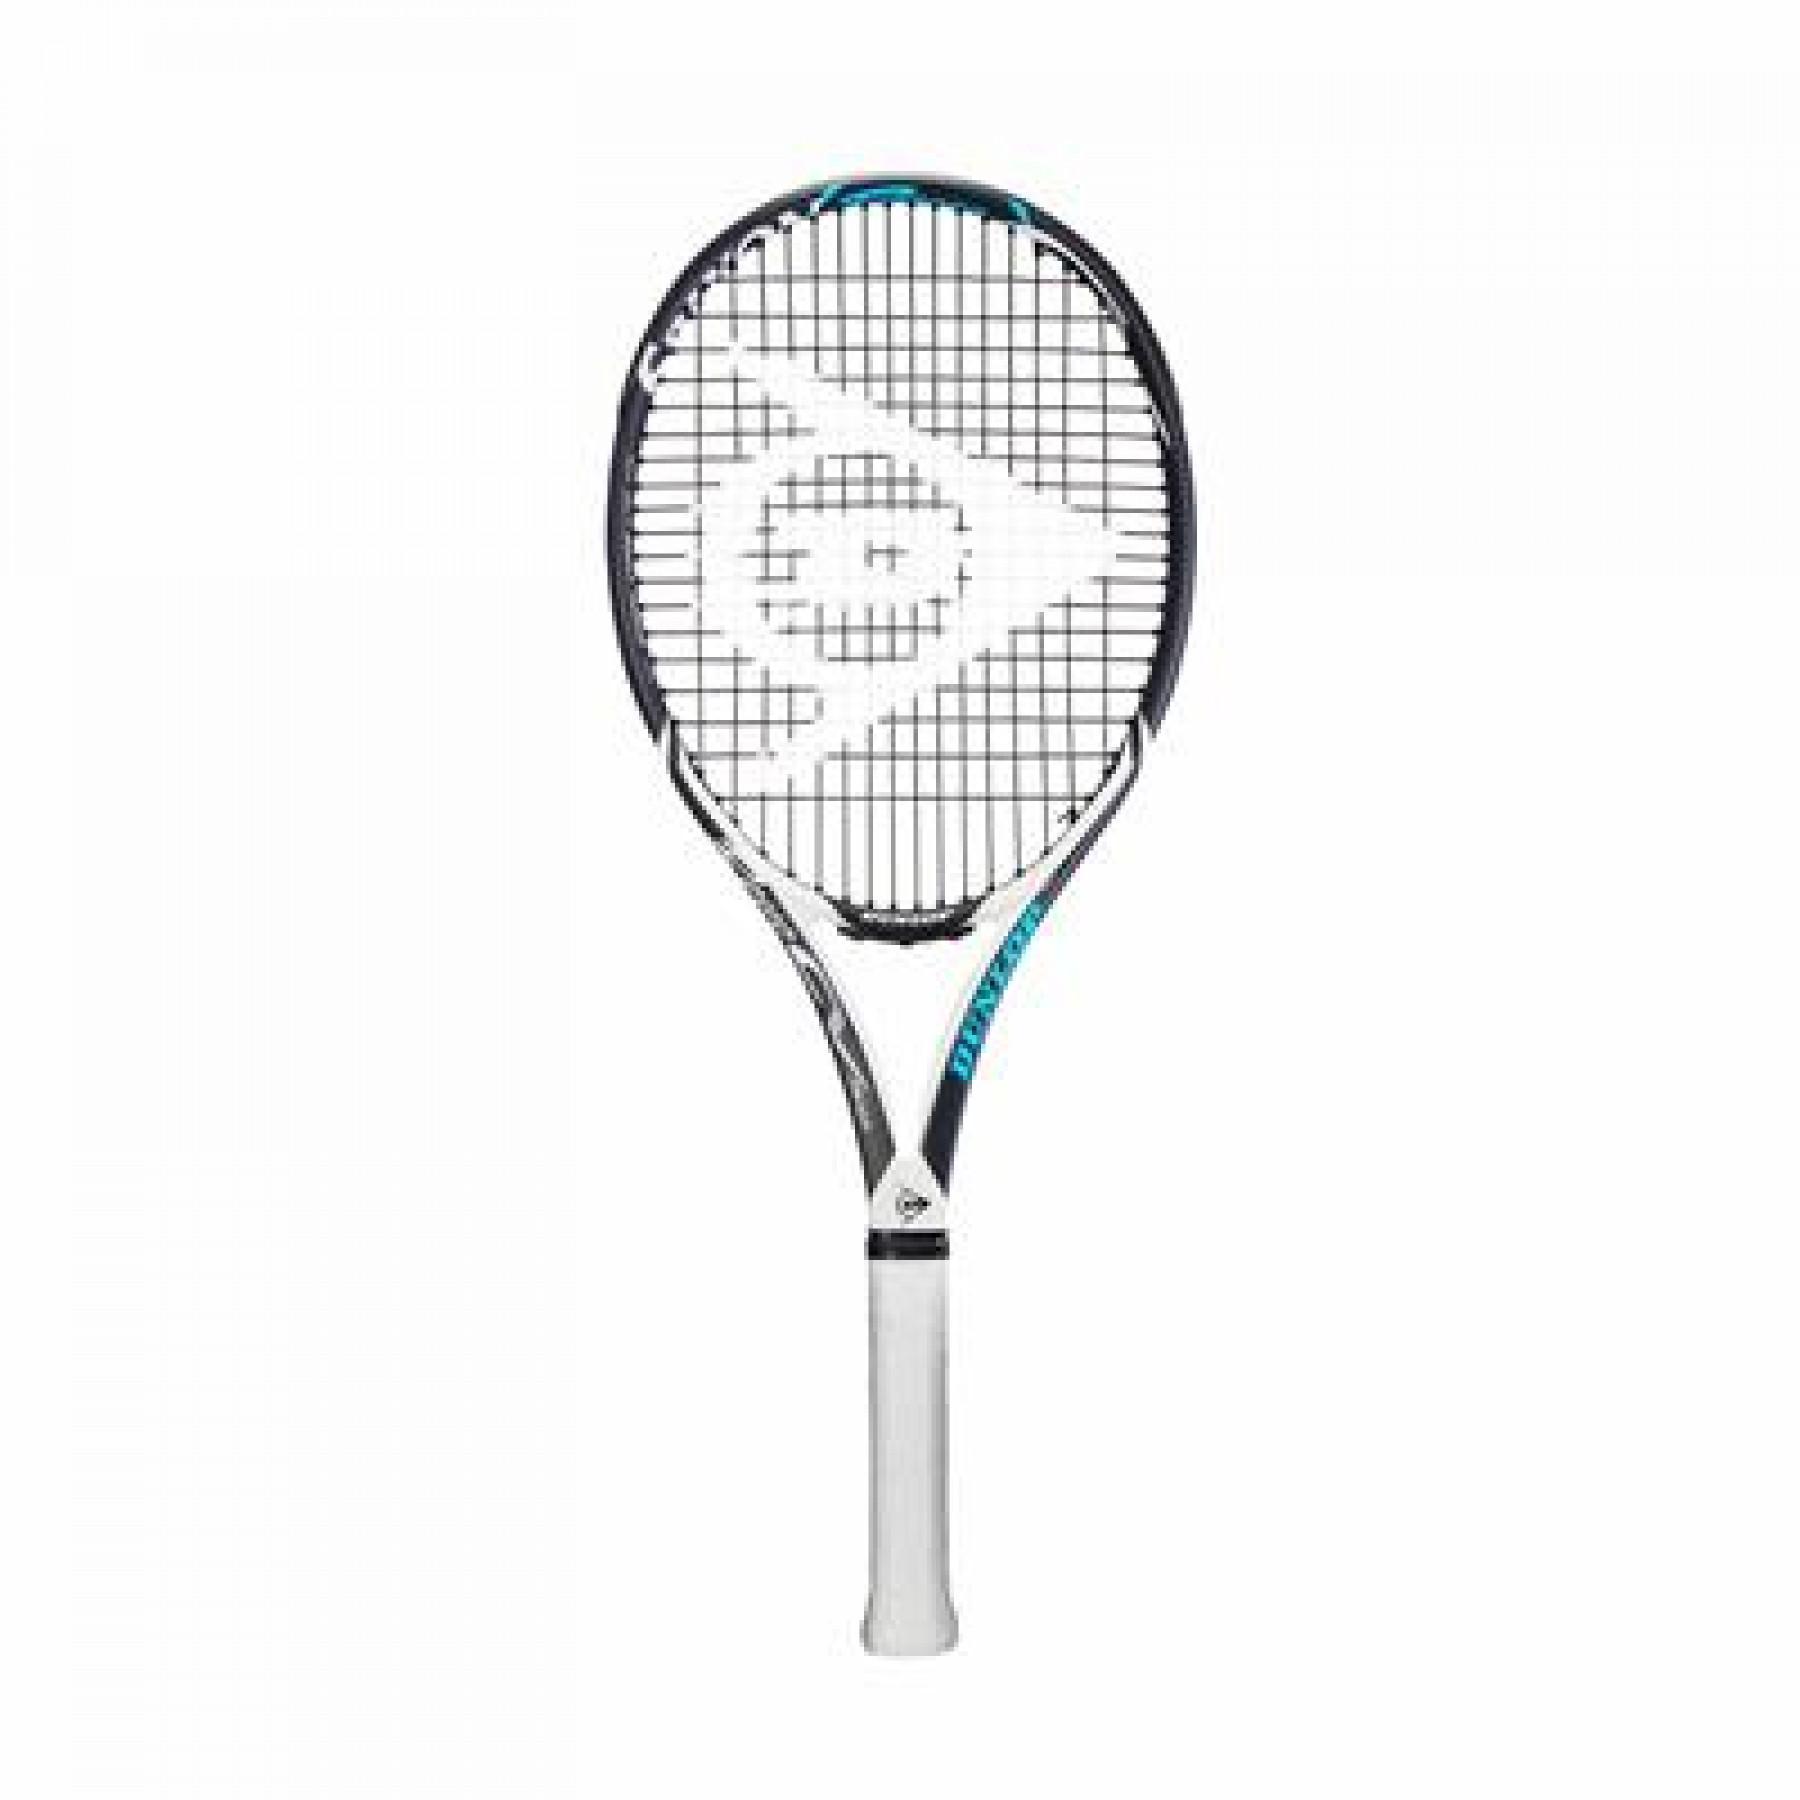 Tennis racket Dunlop Tf Srx 18Revo cv 5.0 G4